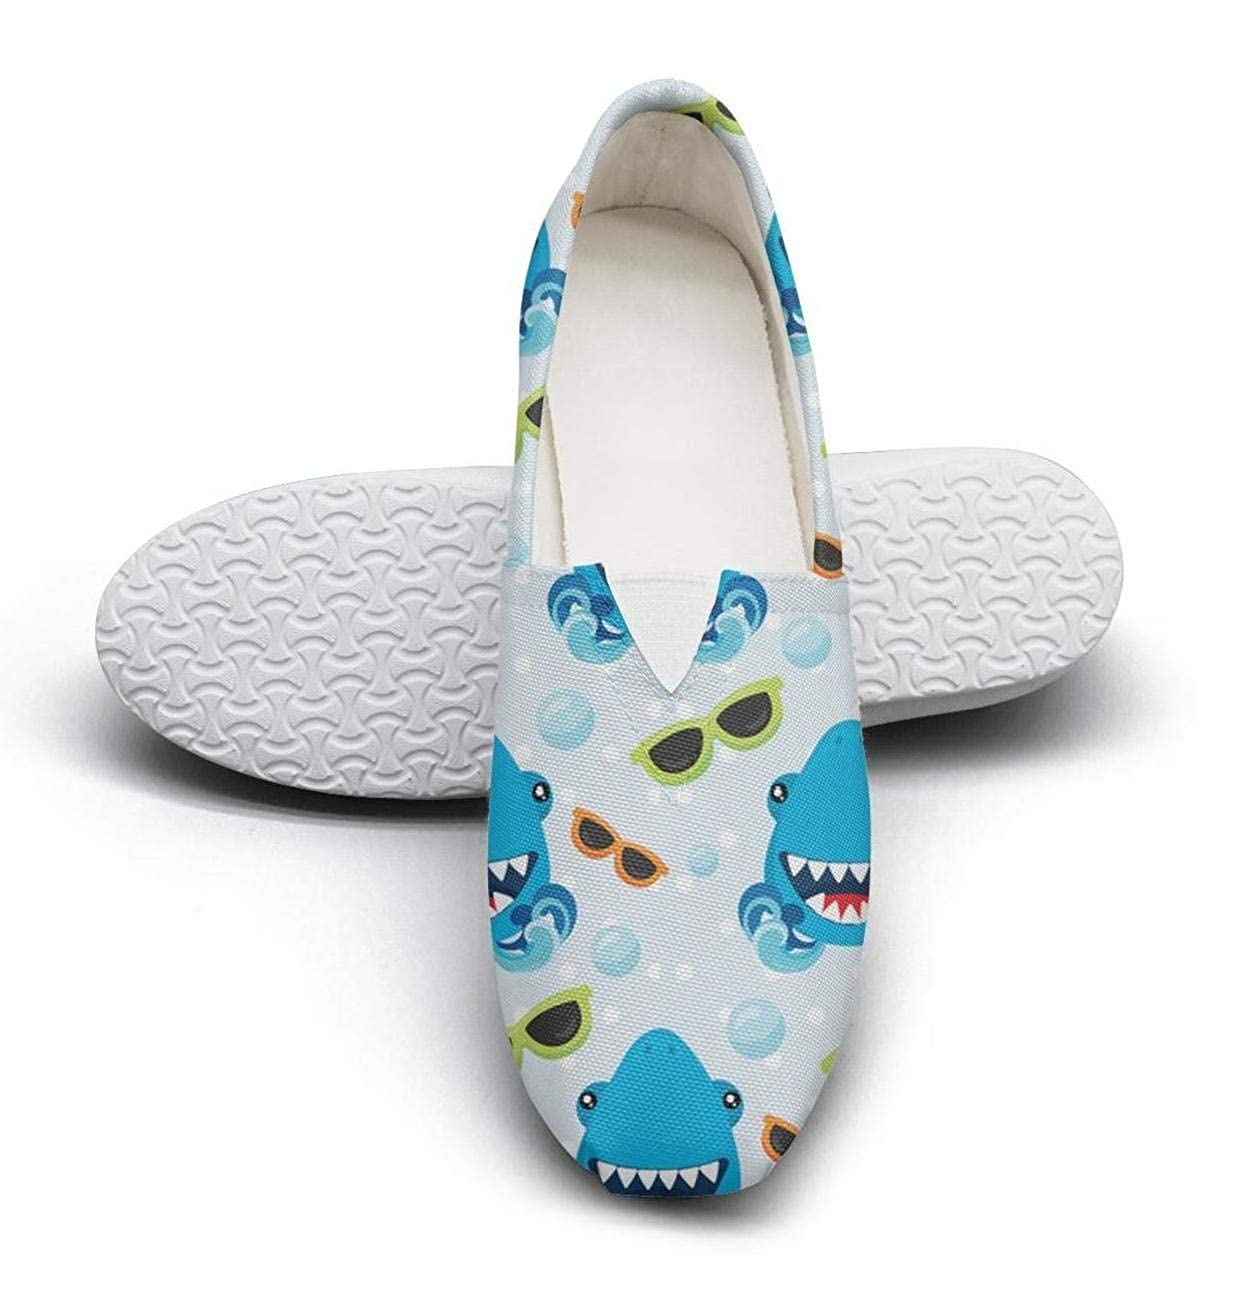 Navy cartoon shark pattern Classic Slip-ONS Women's Comfort Flat Boat Shoes Ladies Espadrille Flats